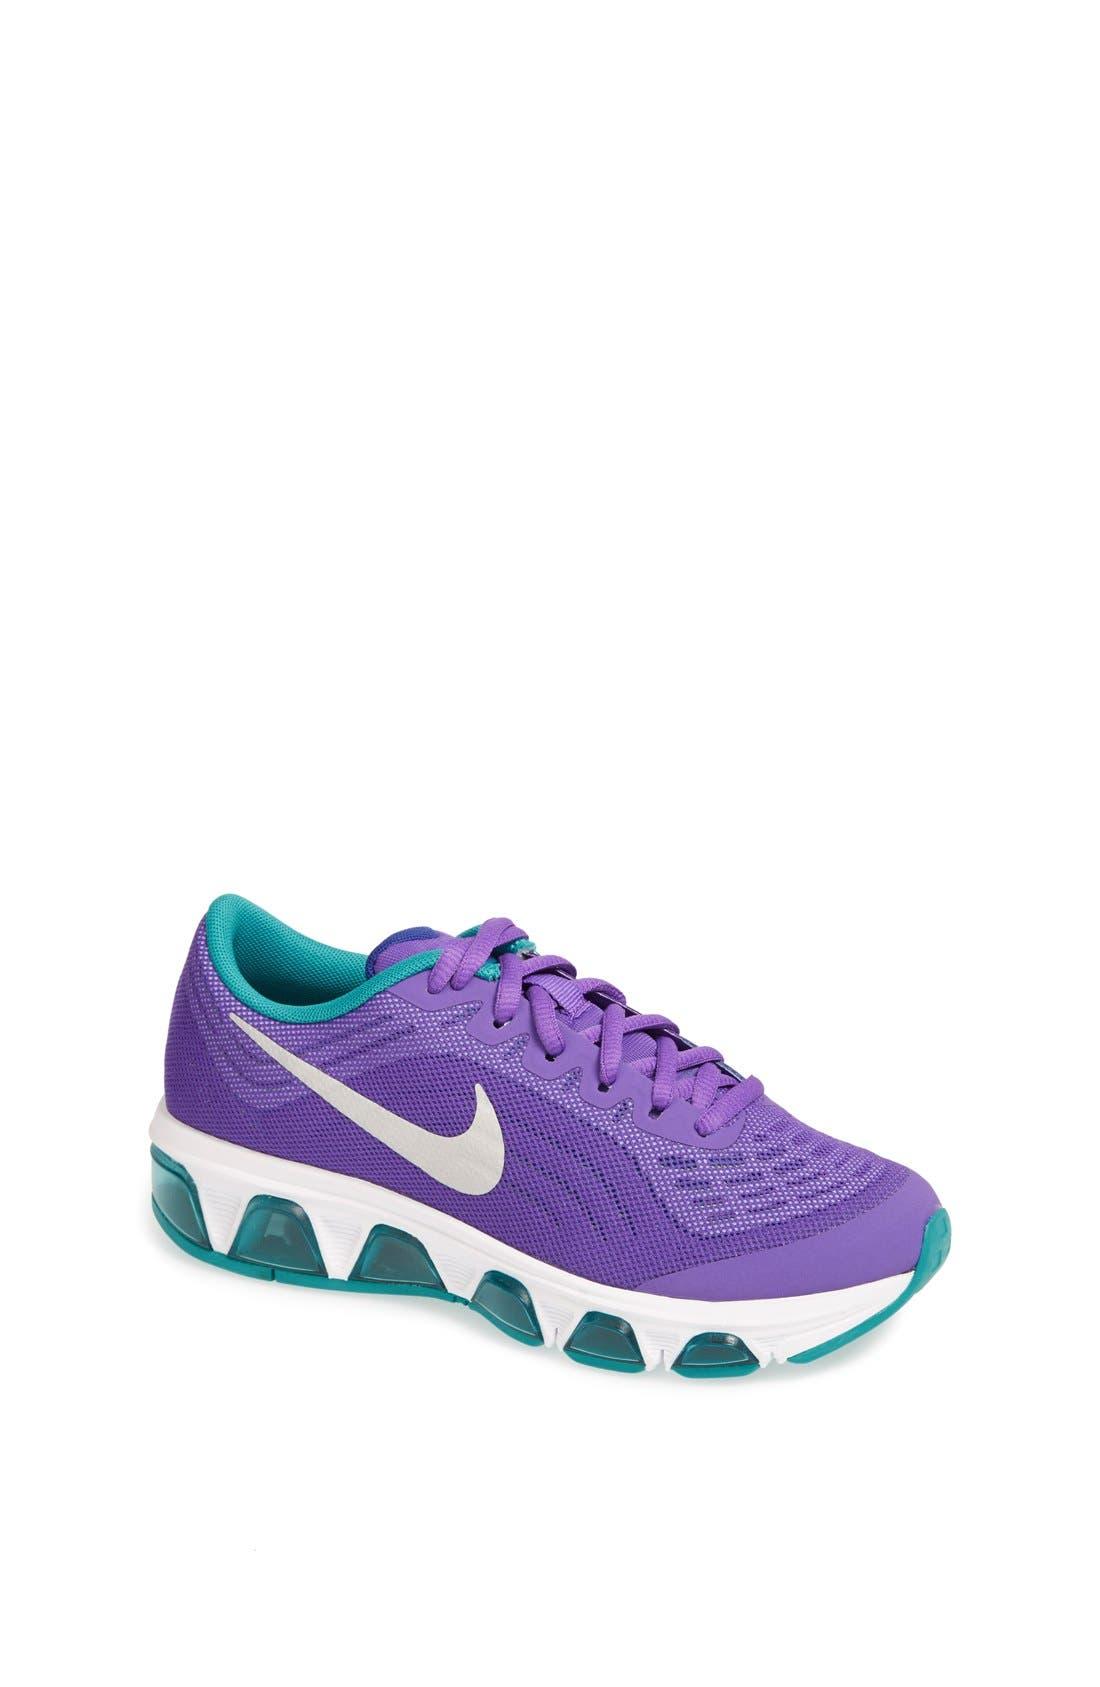 Alternate Image 1 Selected - Nike 'Air Max Tailwind+' Running Shoe (Big Kid)